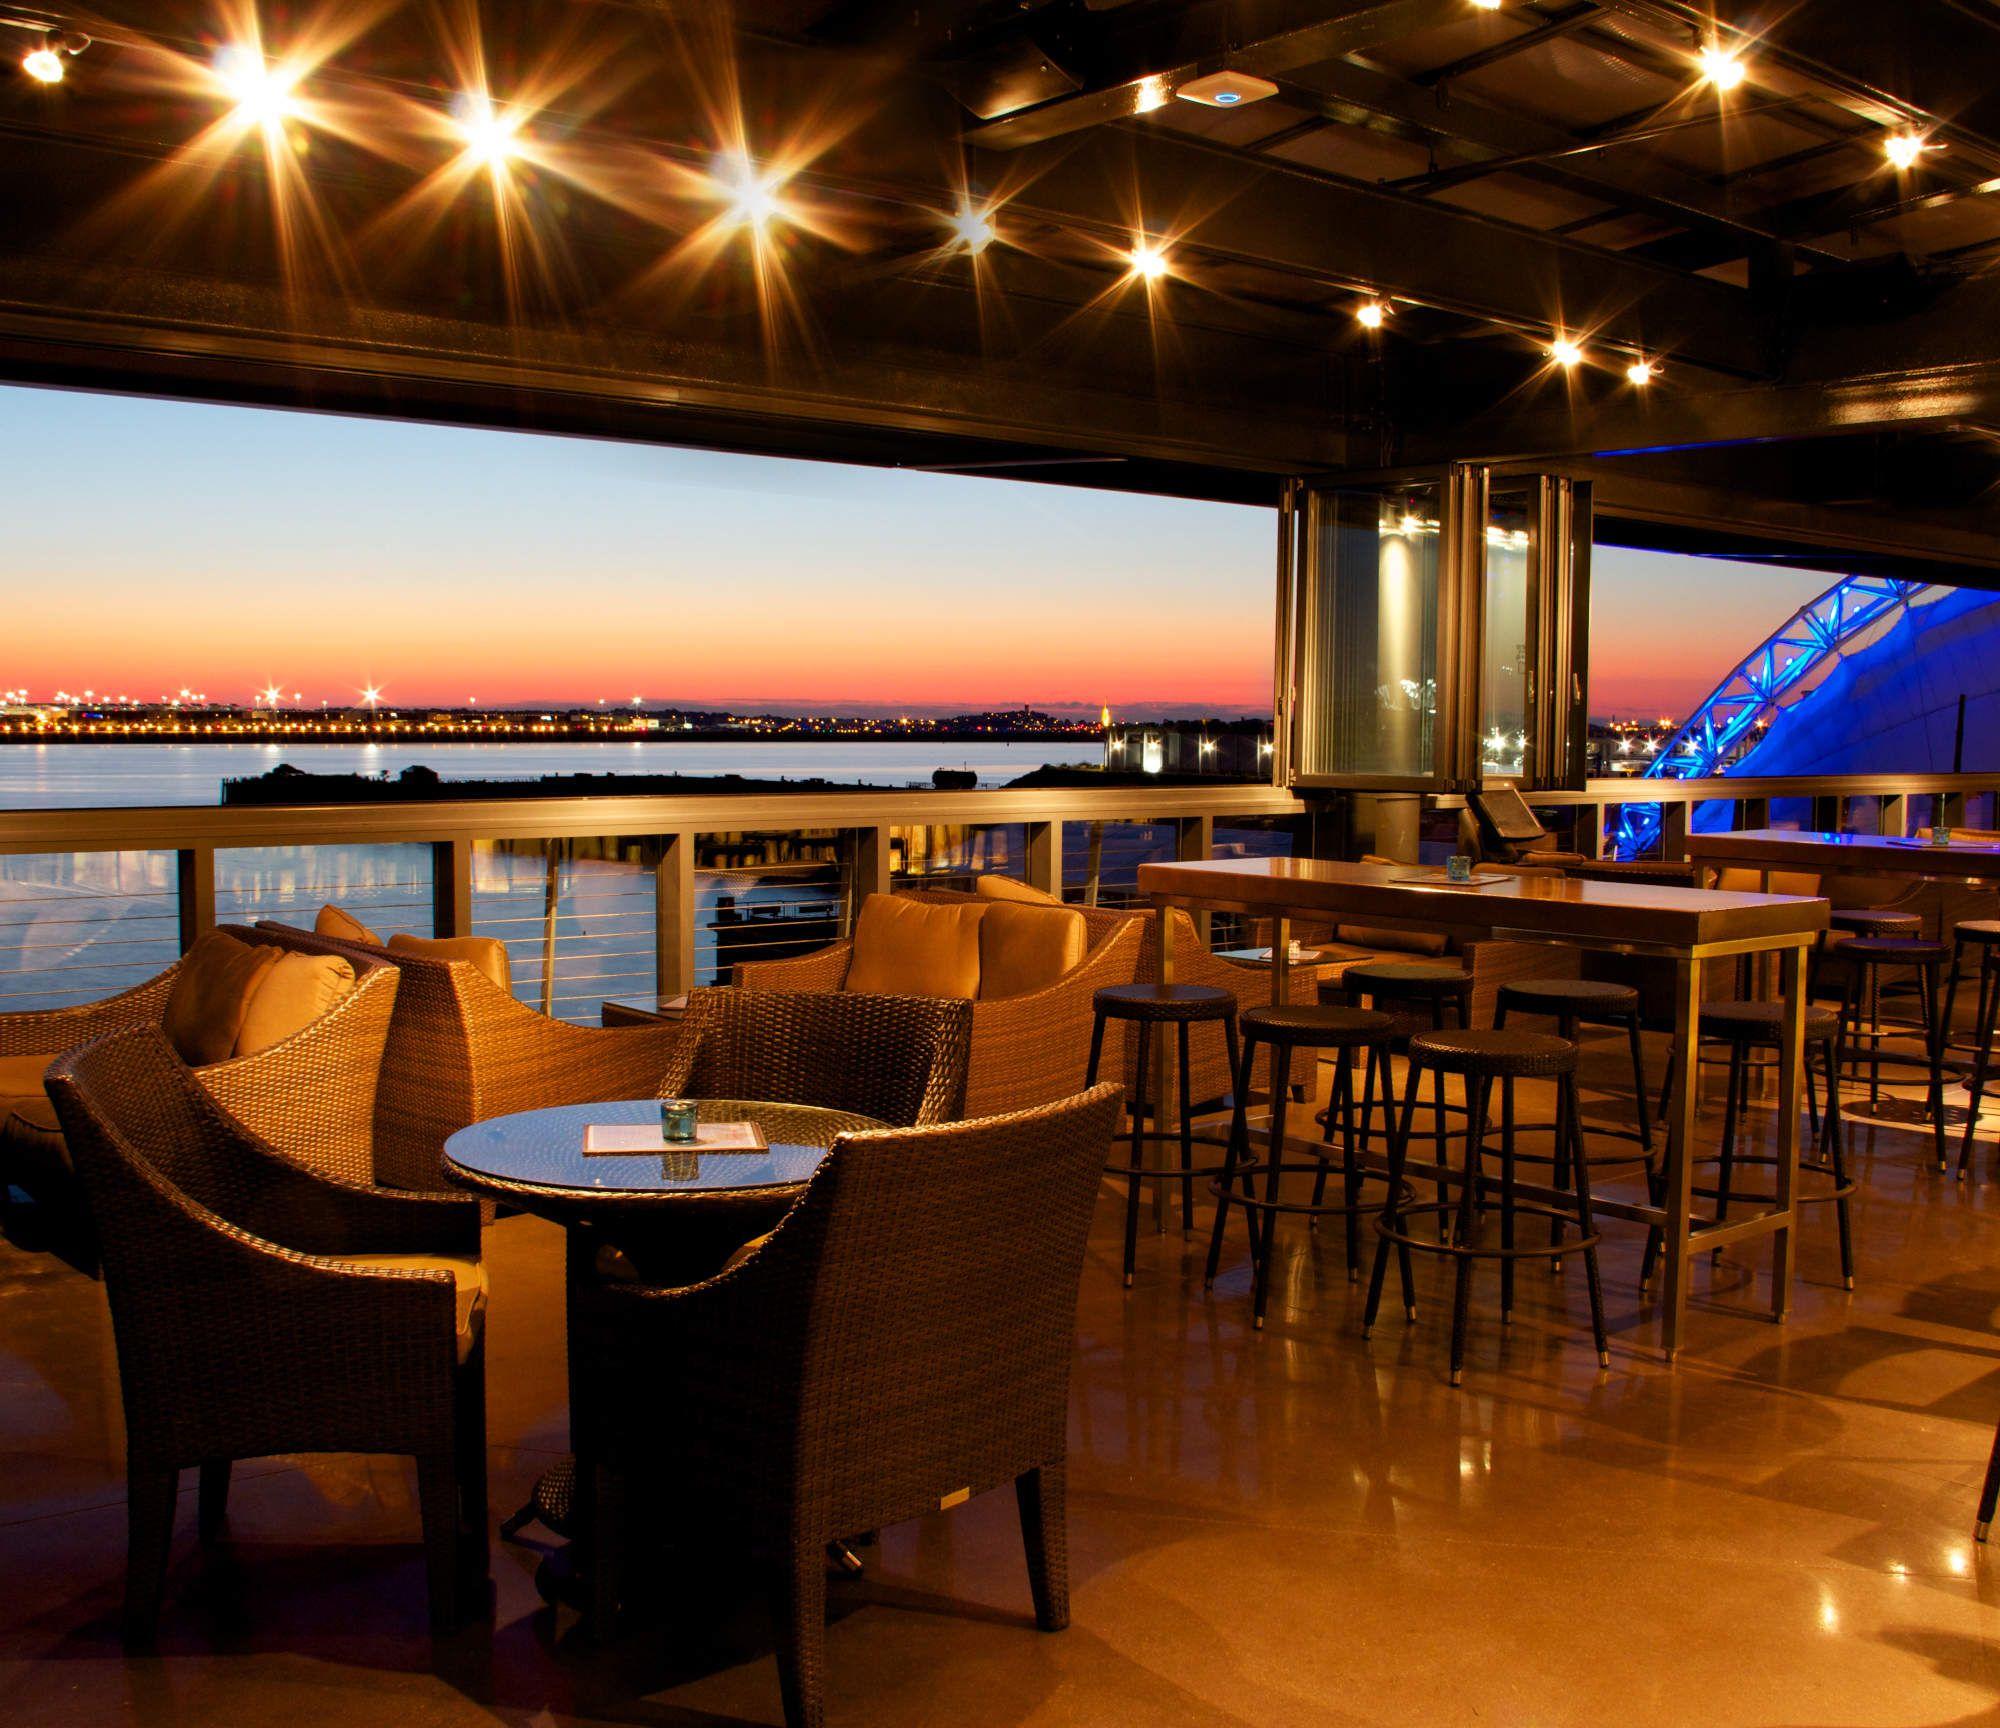 The Best Rooftop Bars In Boston Boston Nightlife Best Rooftop Bars Rooftop Bar